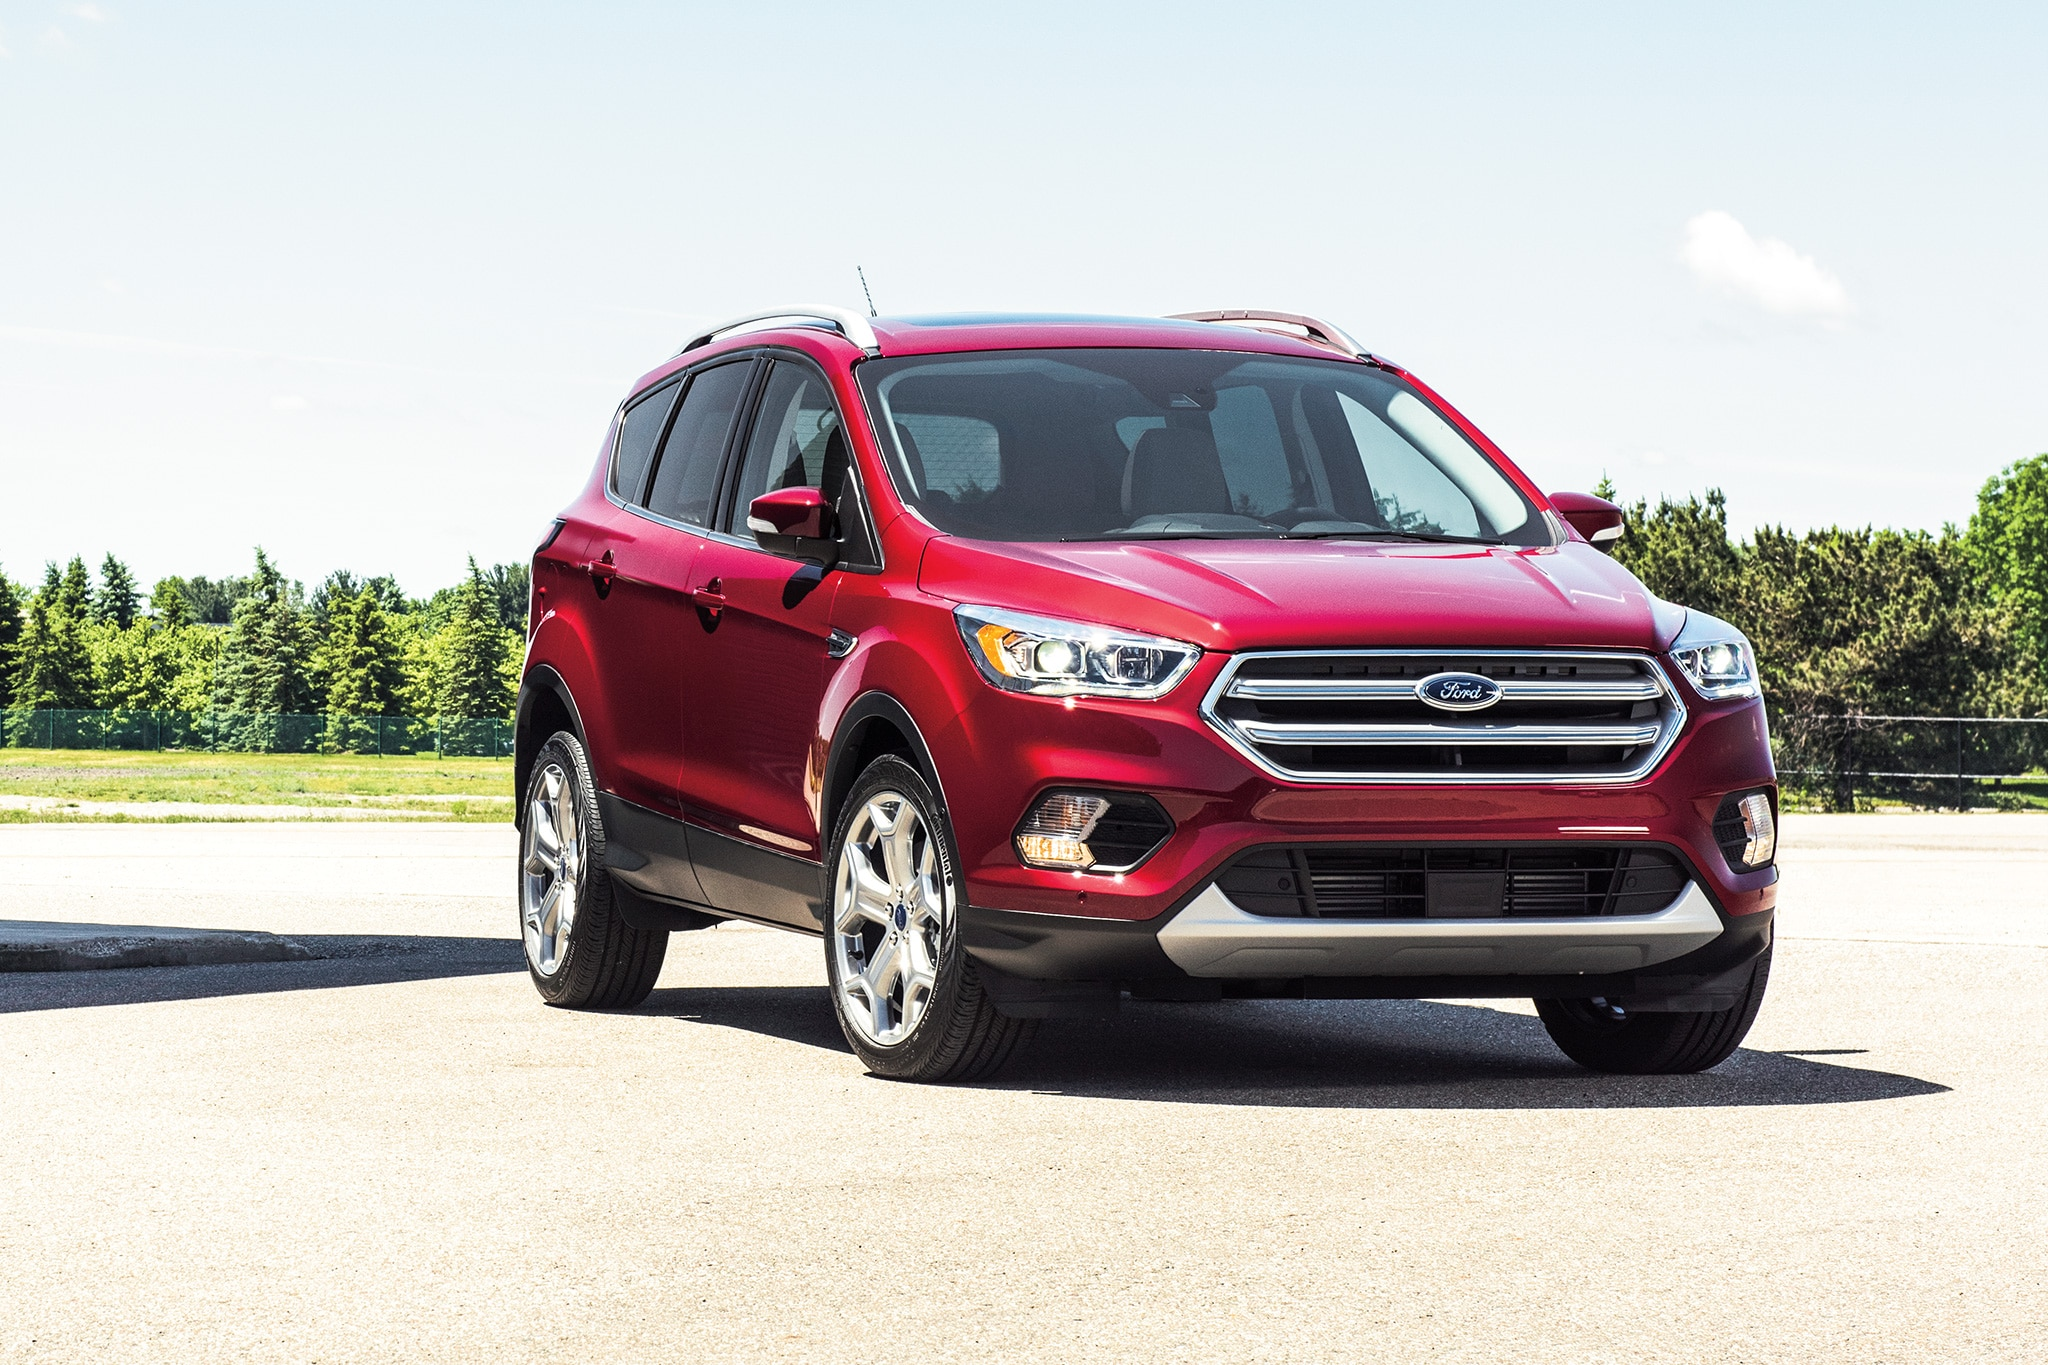 Ford Readies Its Next C-Segment World Car Platform